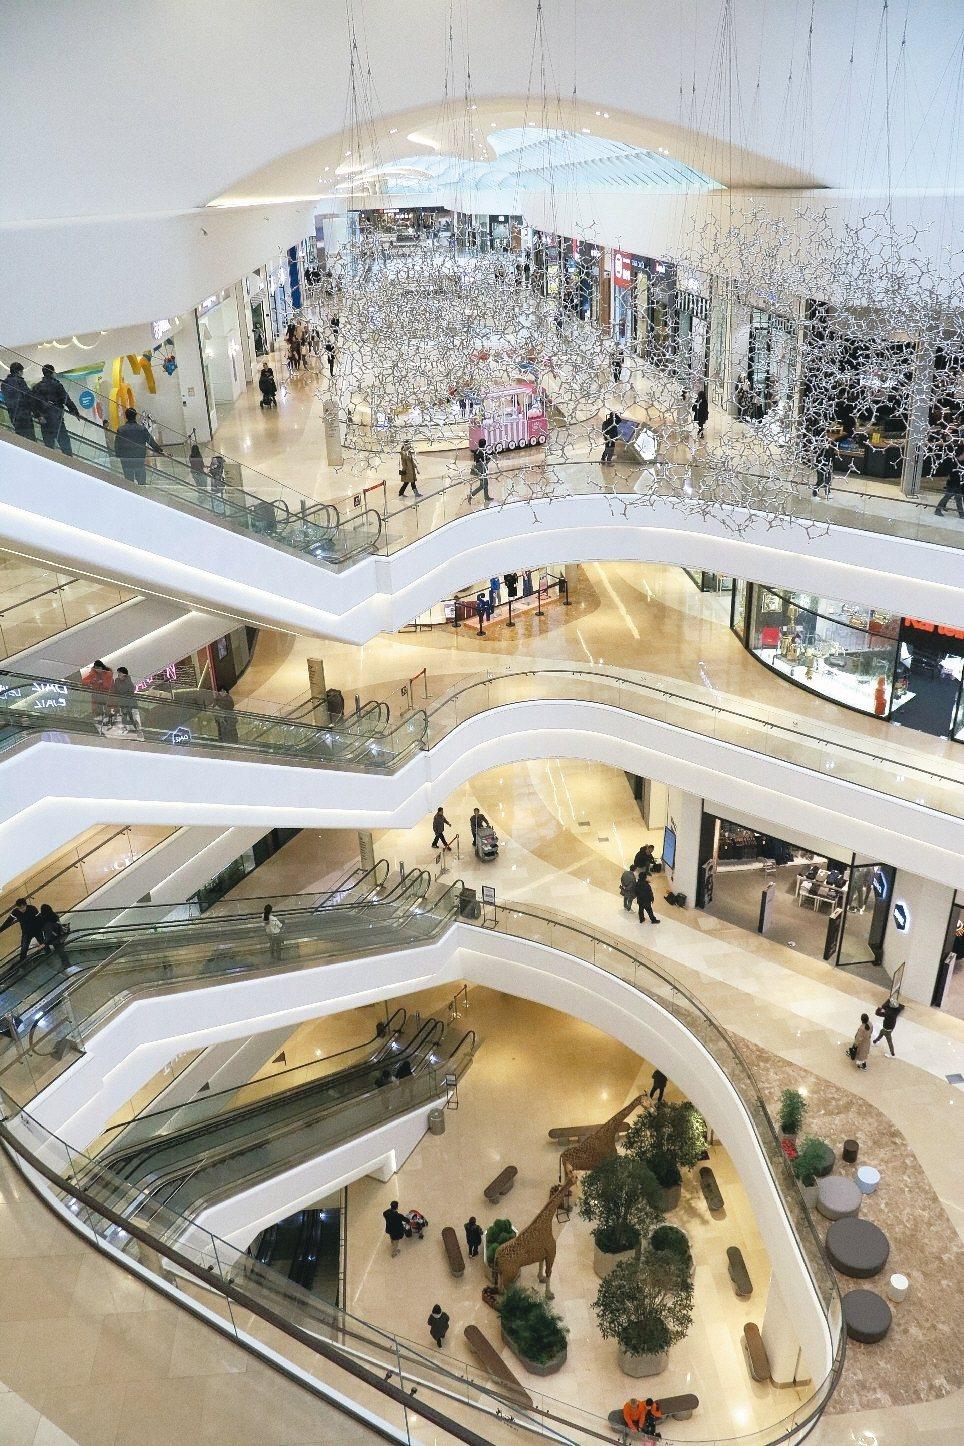 Starfield購物中心去年9月才開幕。 記者史榮恩/攝影